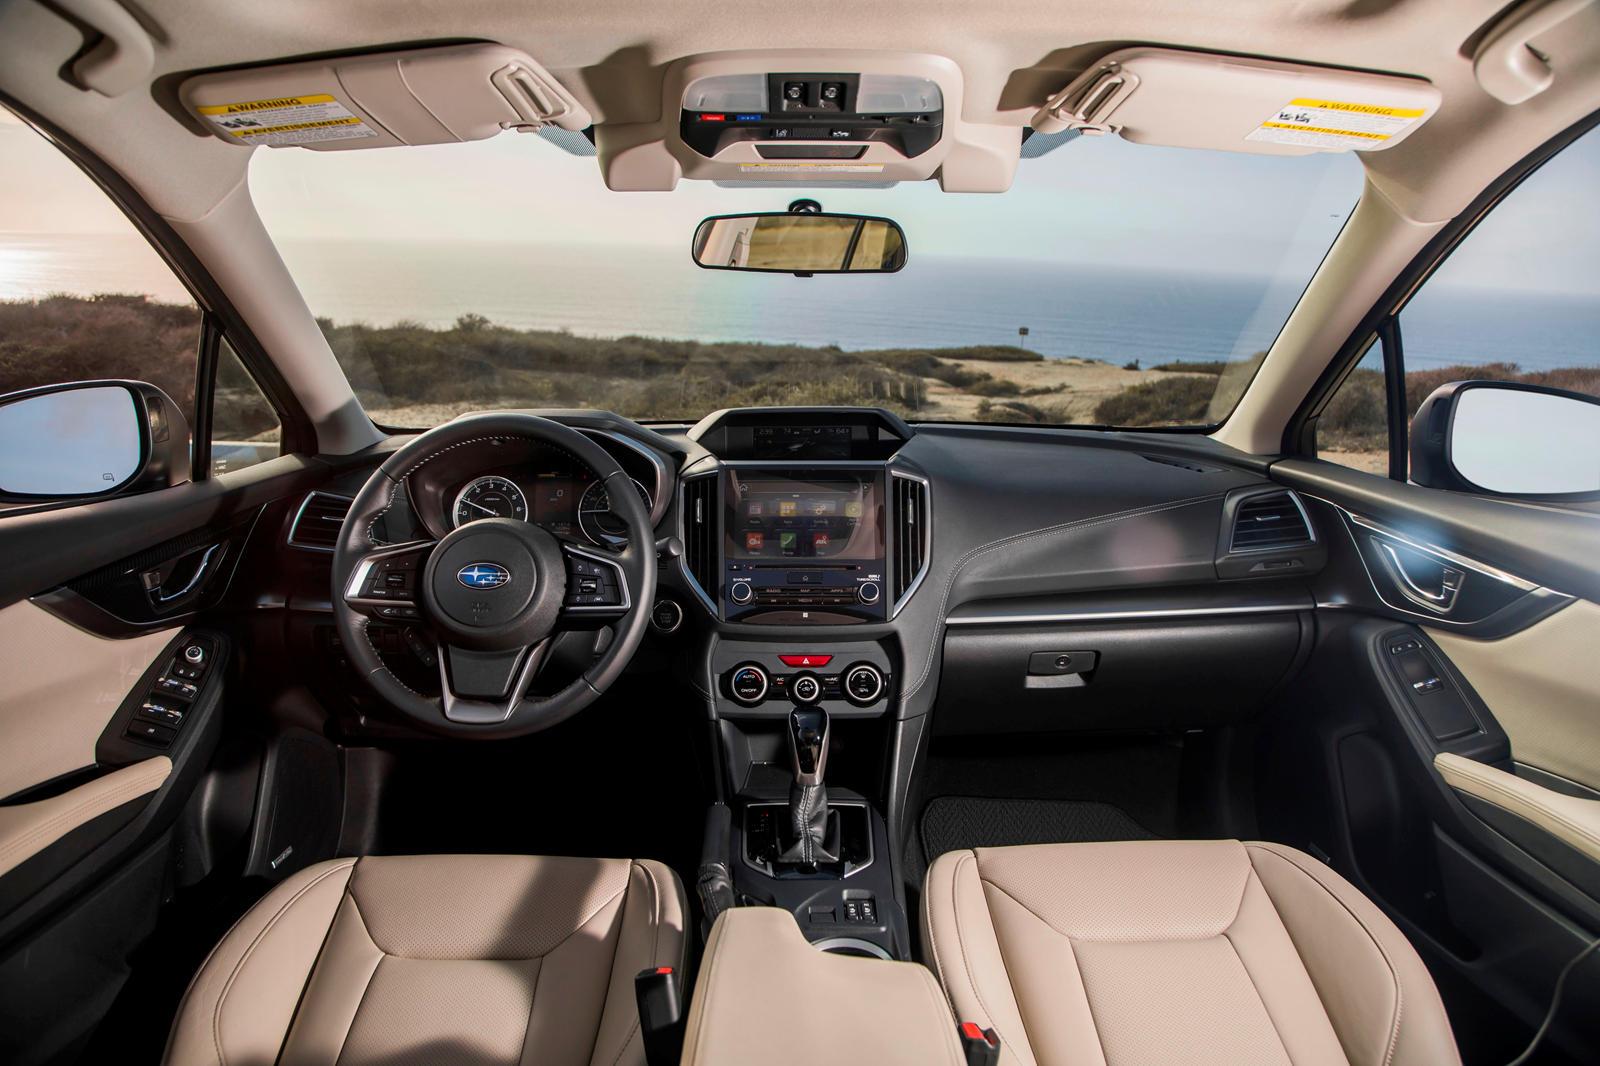 2017-2020 Subaru Impreza Sedan Dashboard